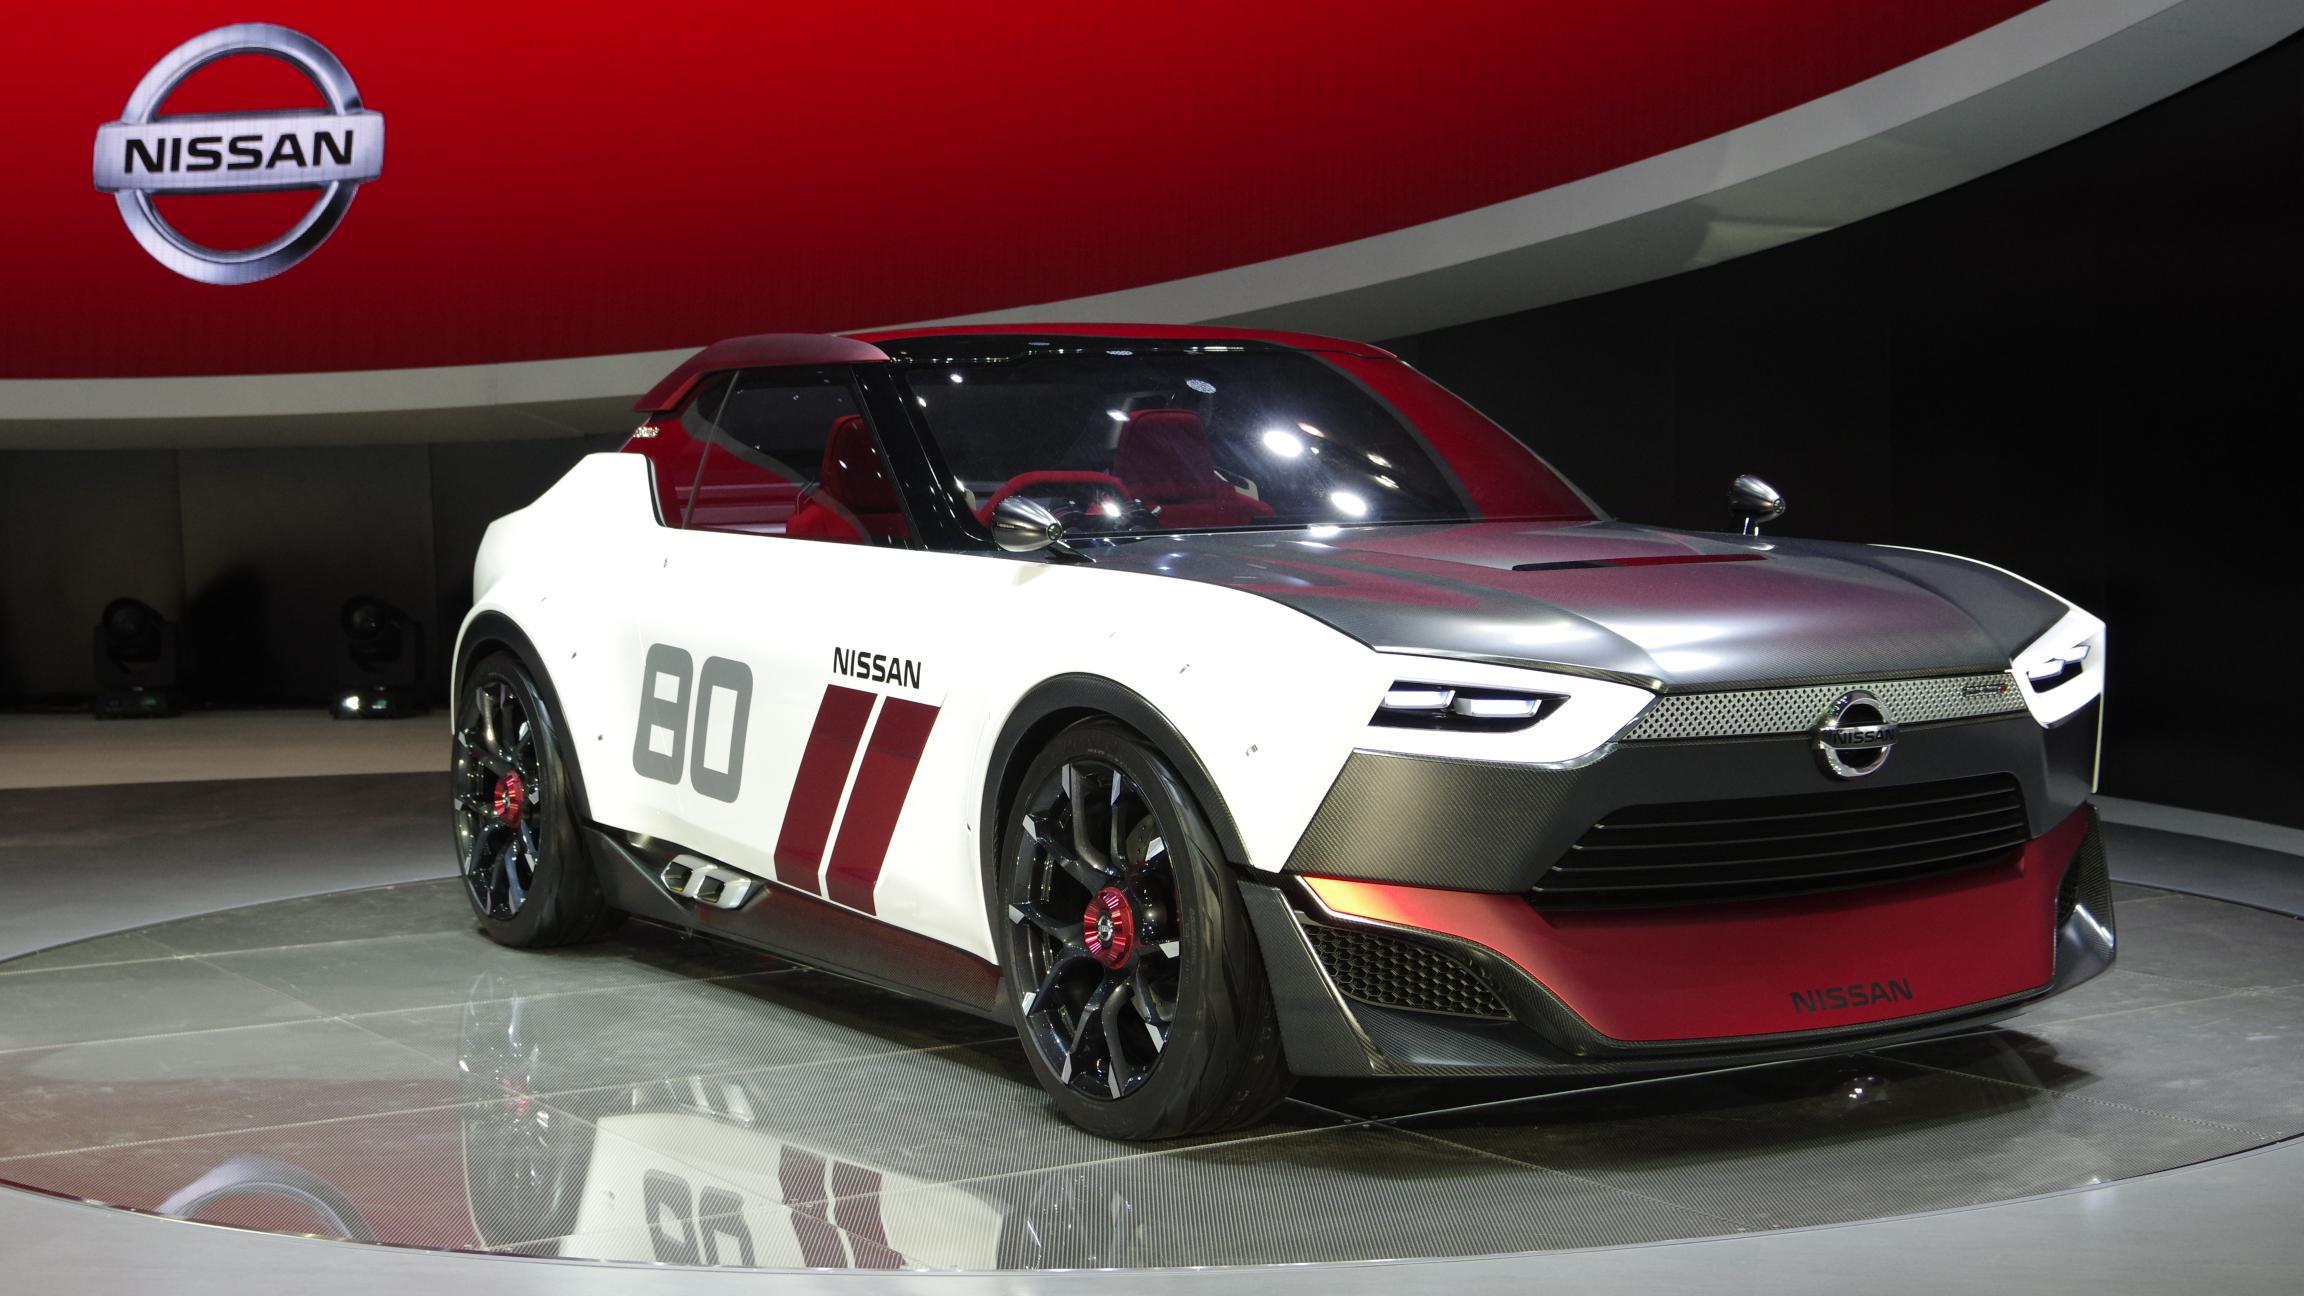 Z Car Blog 187 Post Topic 187 Nissan S New Datsun 510